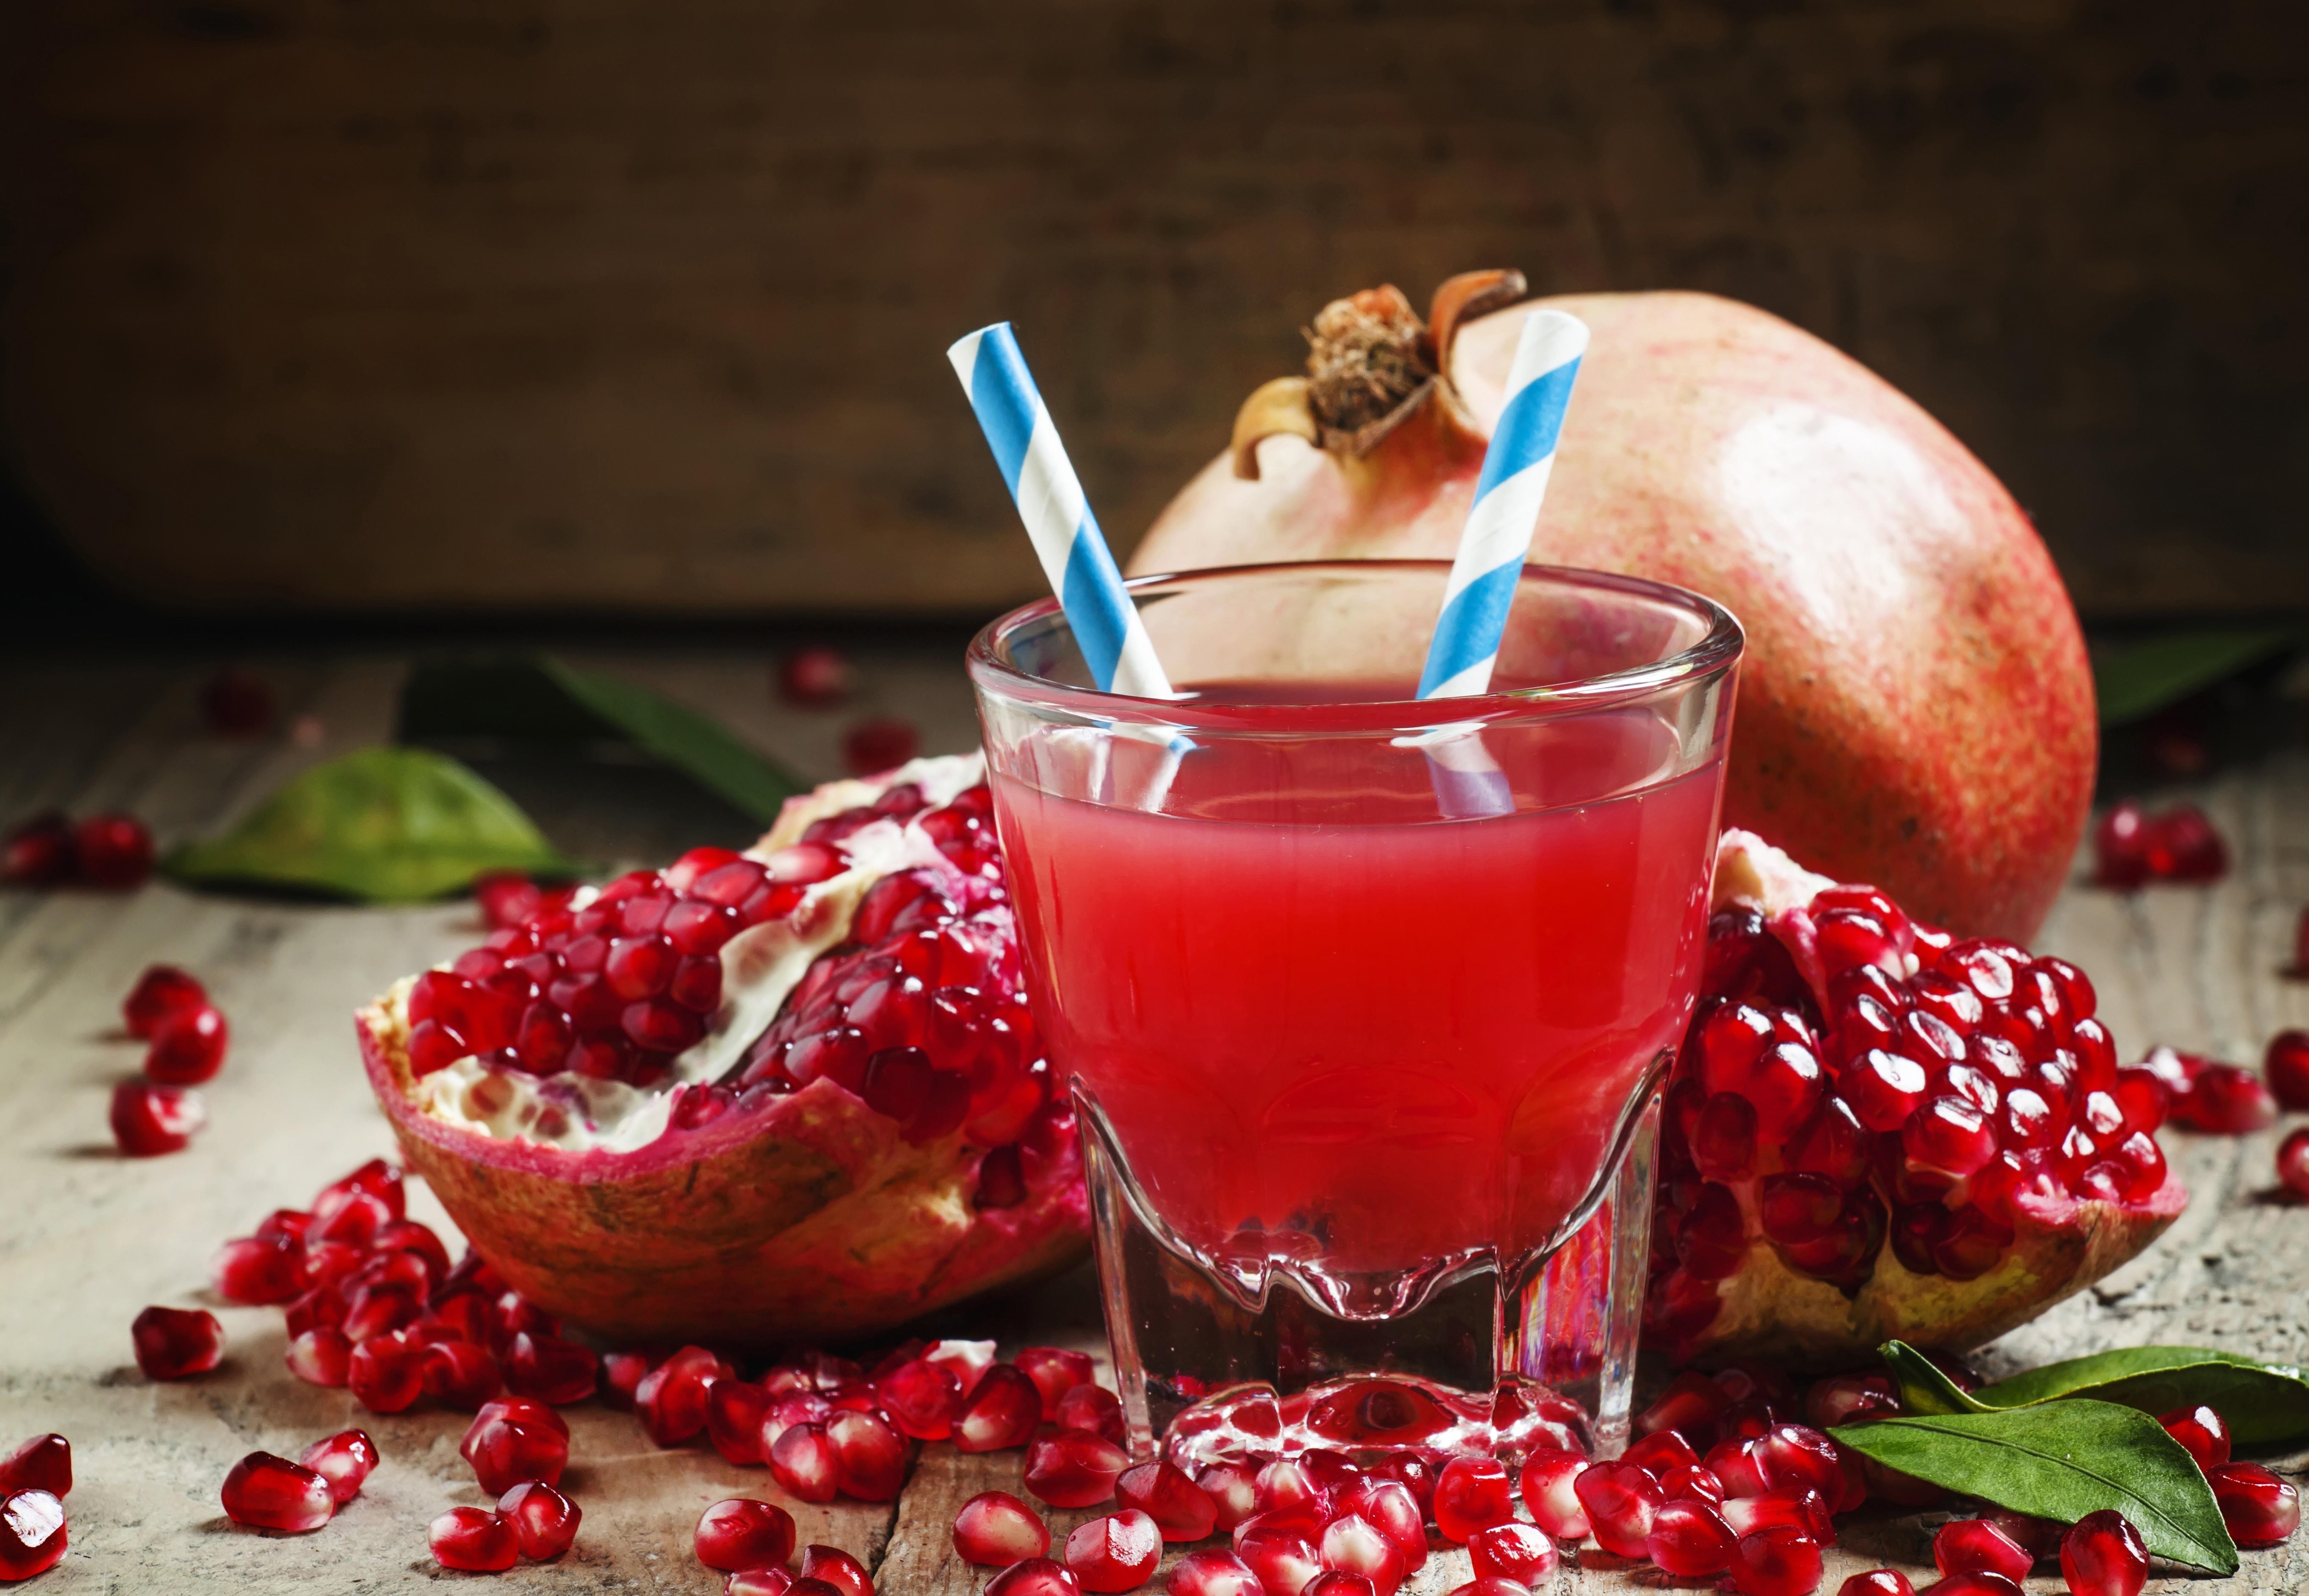 картинки на рабочий стол еда и напитки расположена